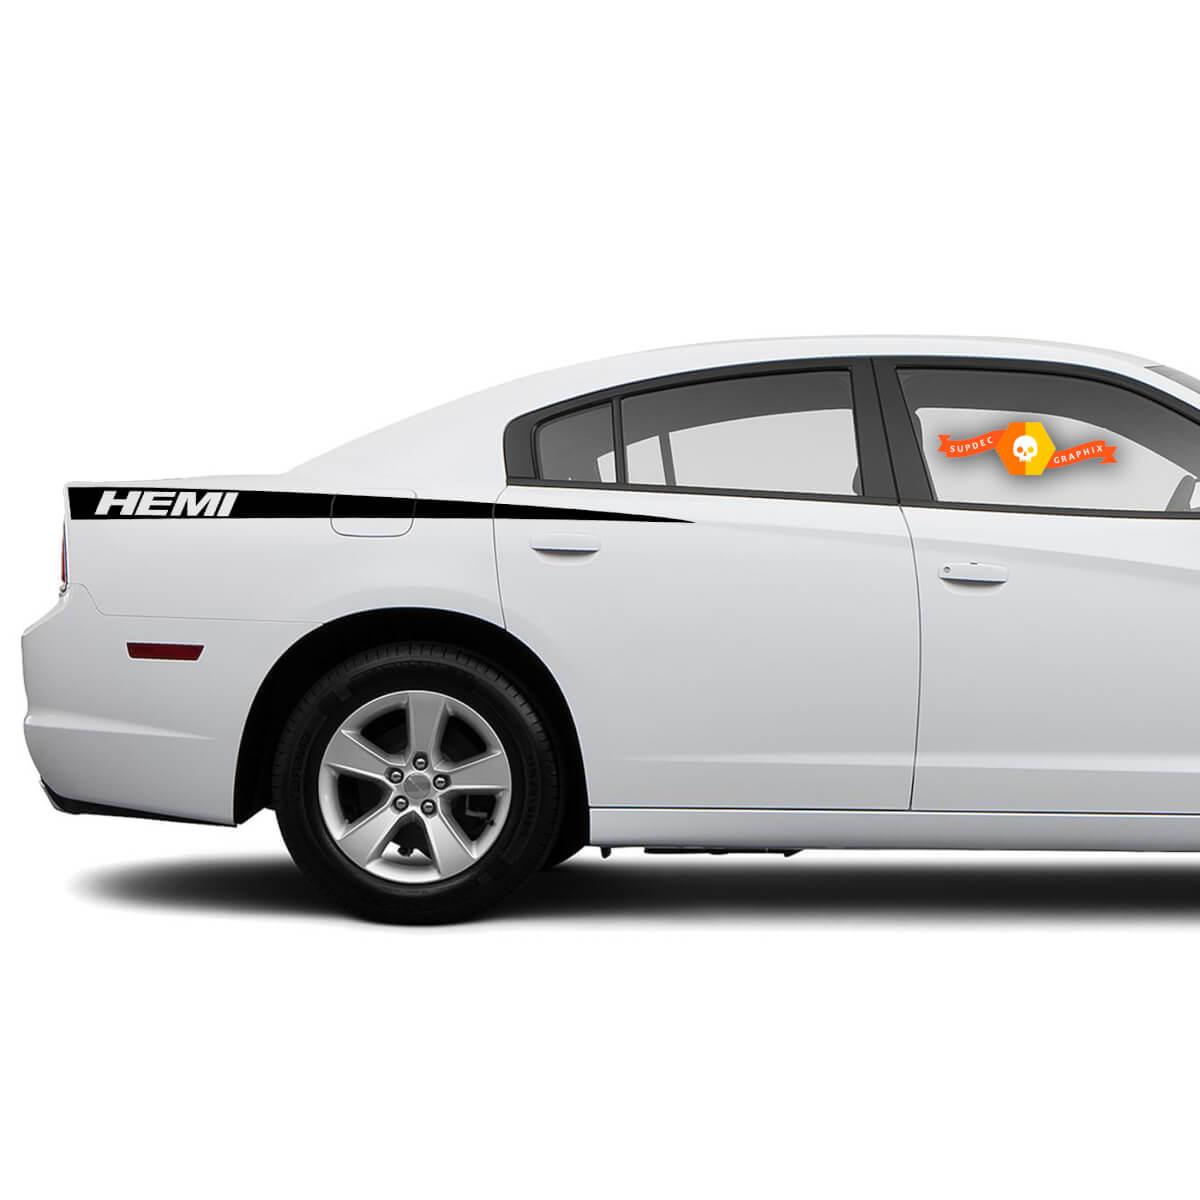 Dodge Charger Hemi Aufkleber Aufkleber Seitengrafiken passen zu Modellen 2011-2014